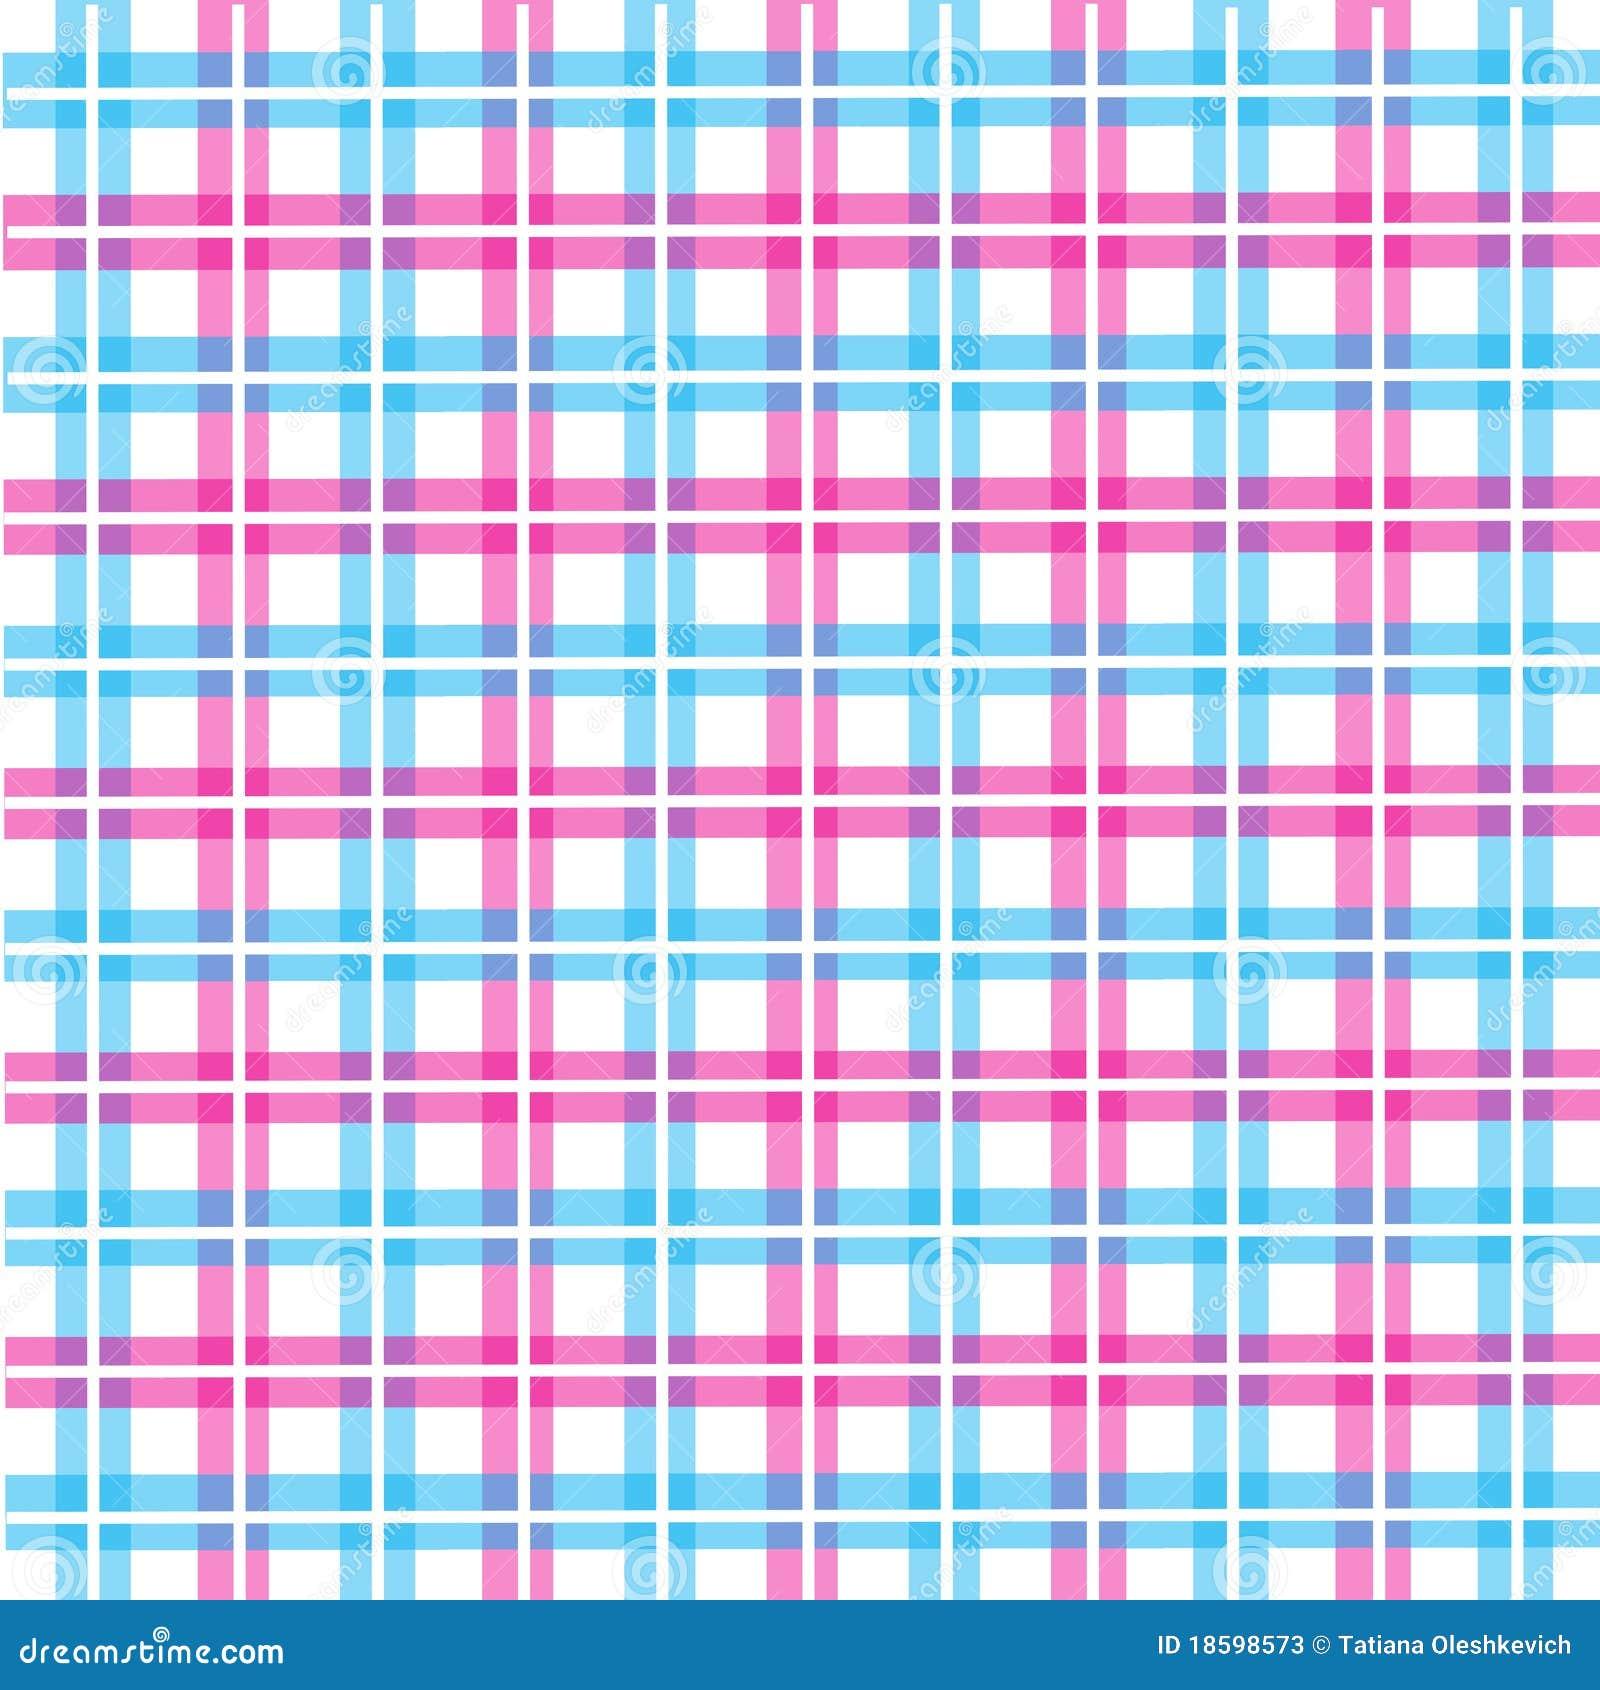 Pattern Picnic Tablecloth Stock Photos - Image: 18598573